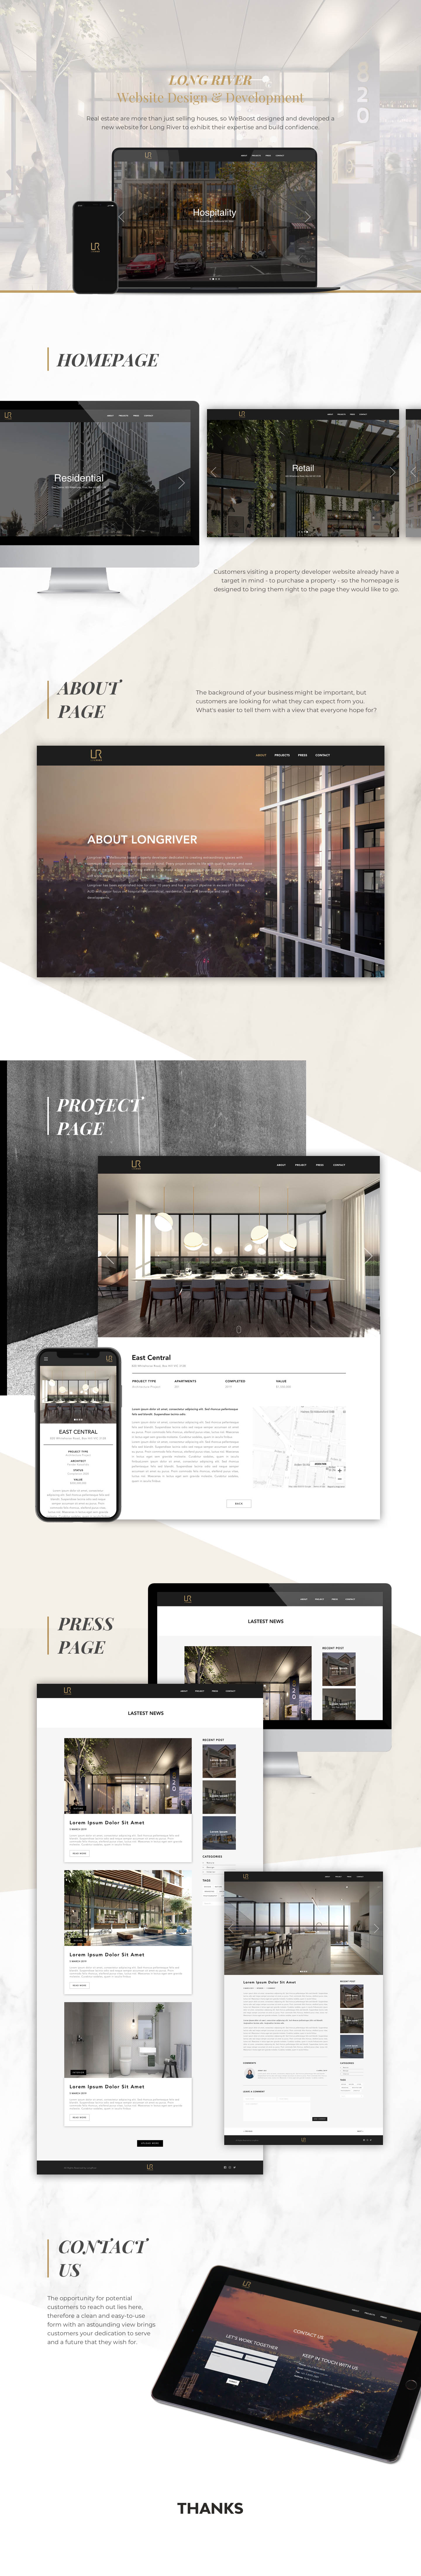 Weboost website design and development for longriver